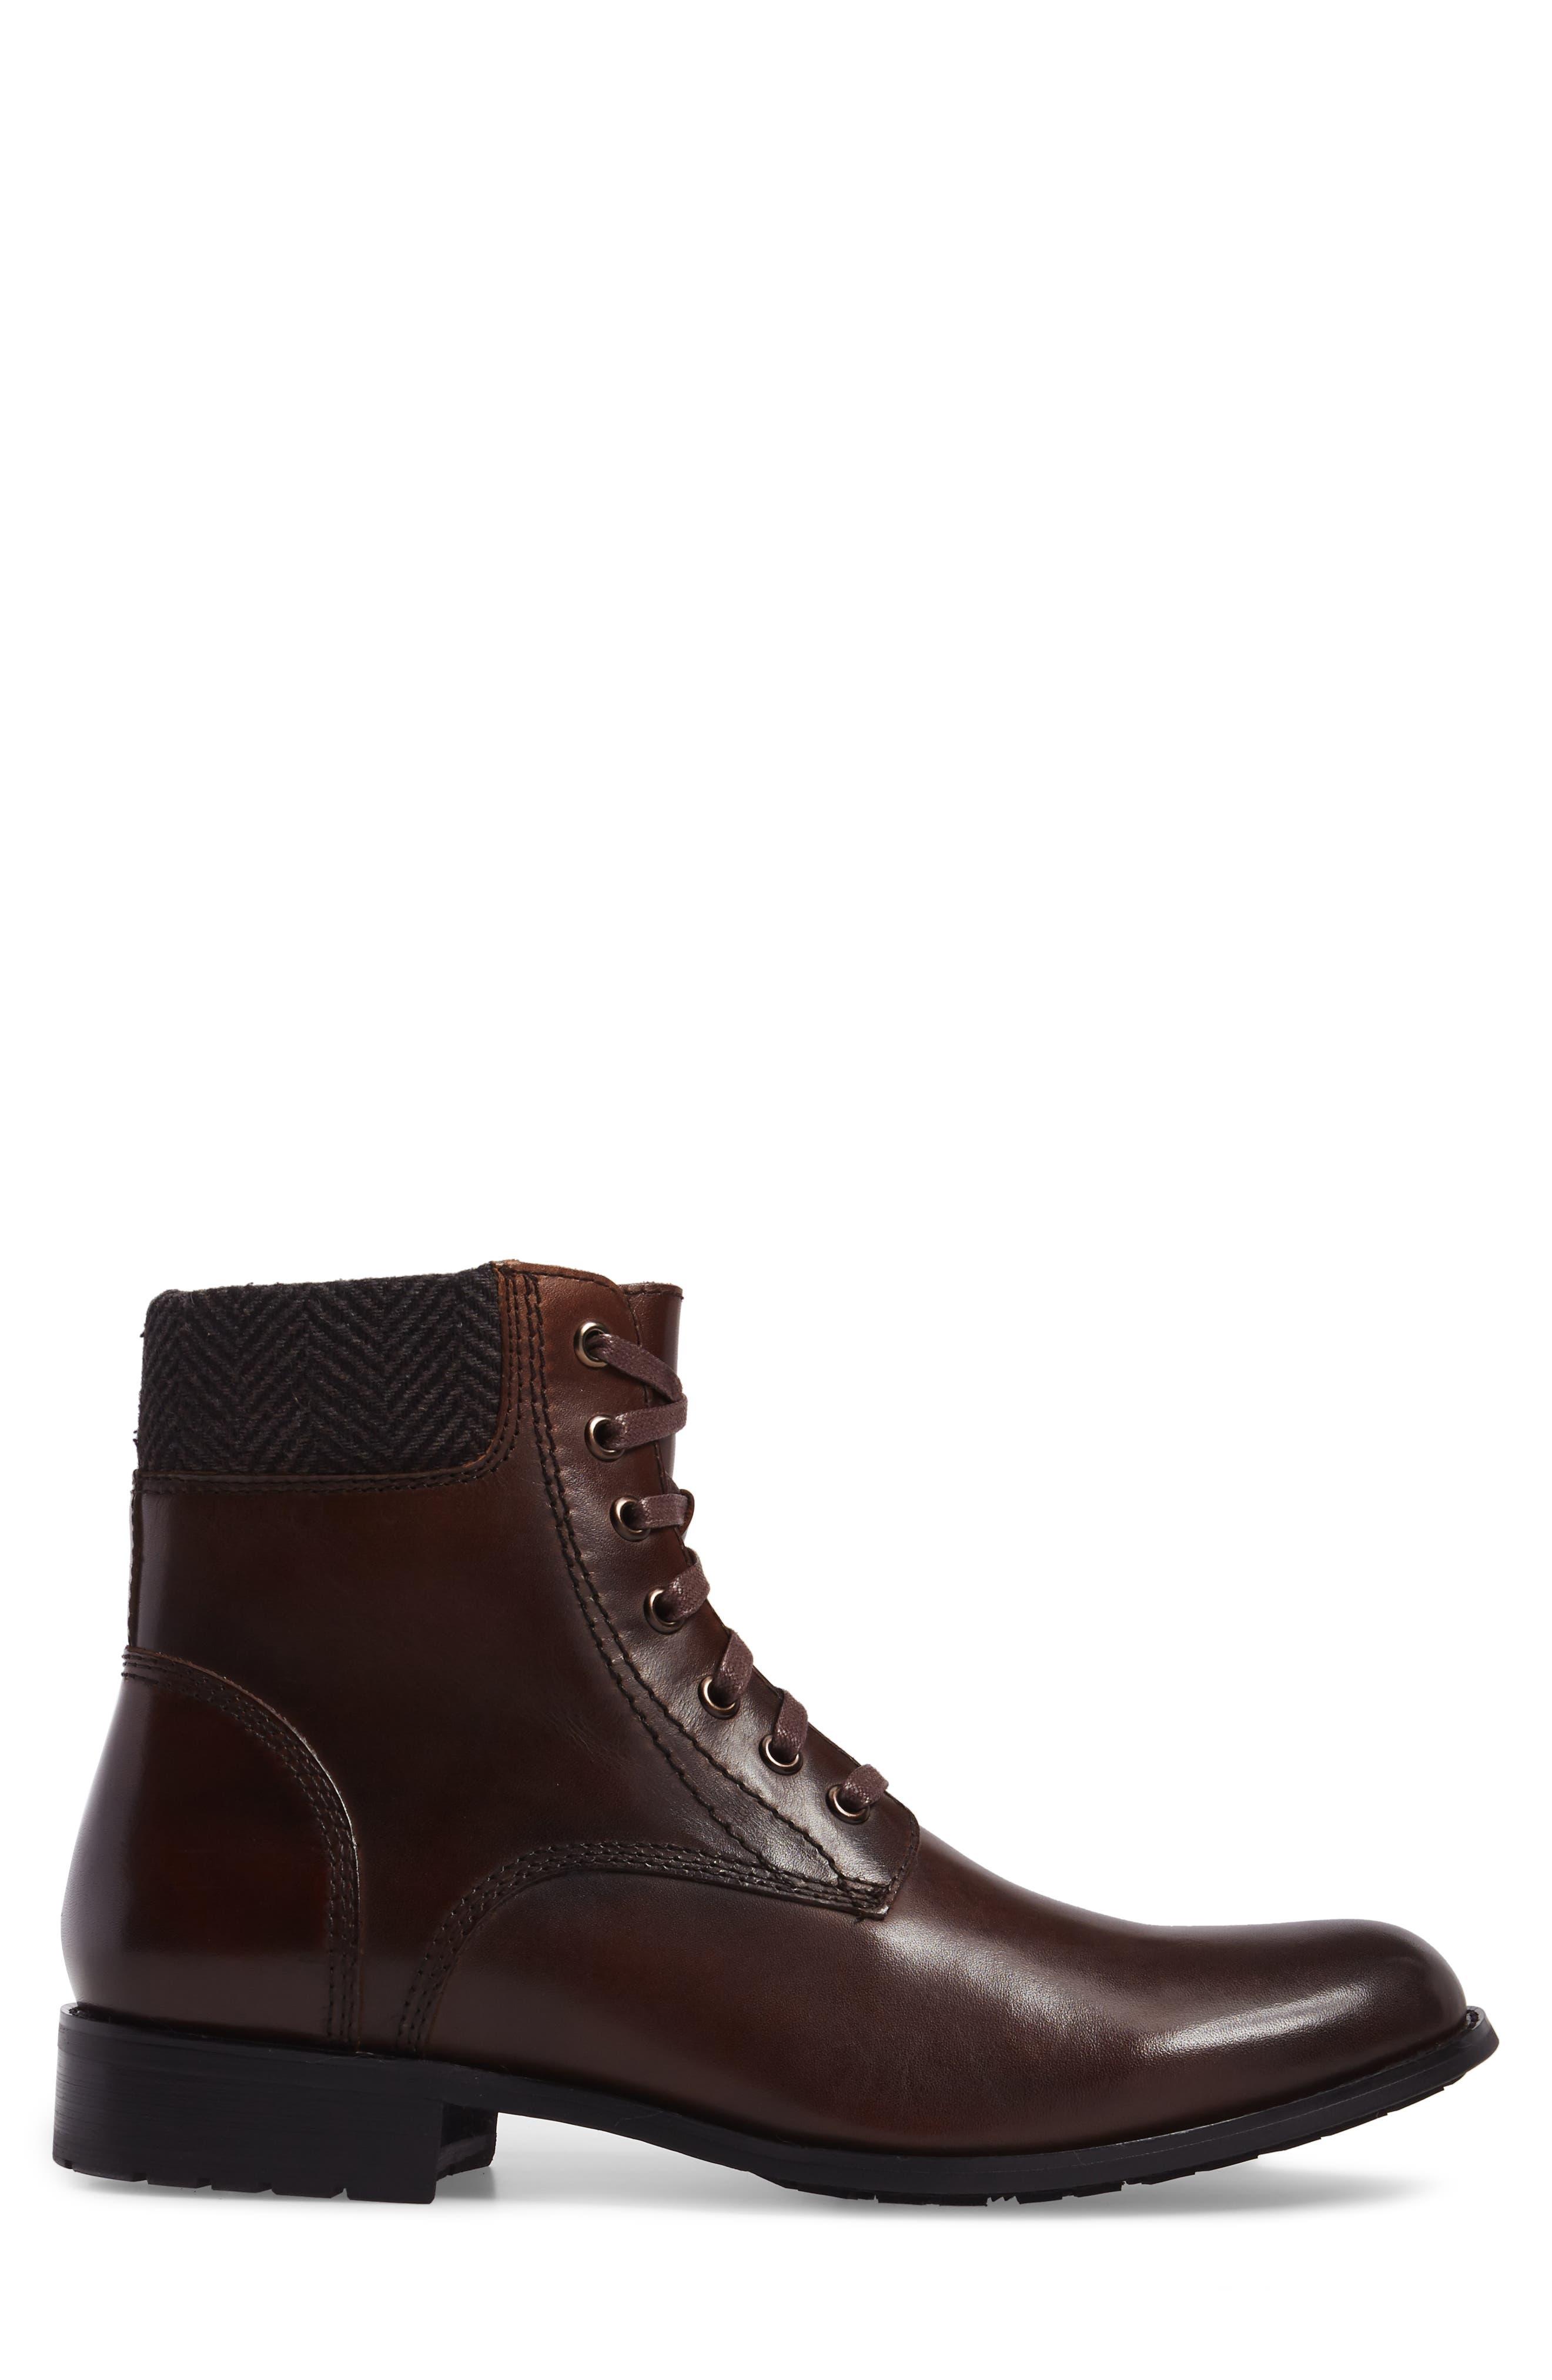 Saar Plain Toe Boot,                             Alternate thumbnail 8, color,